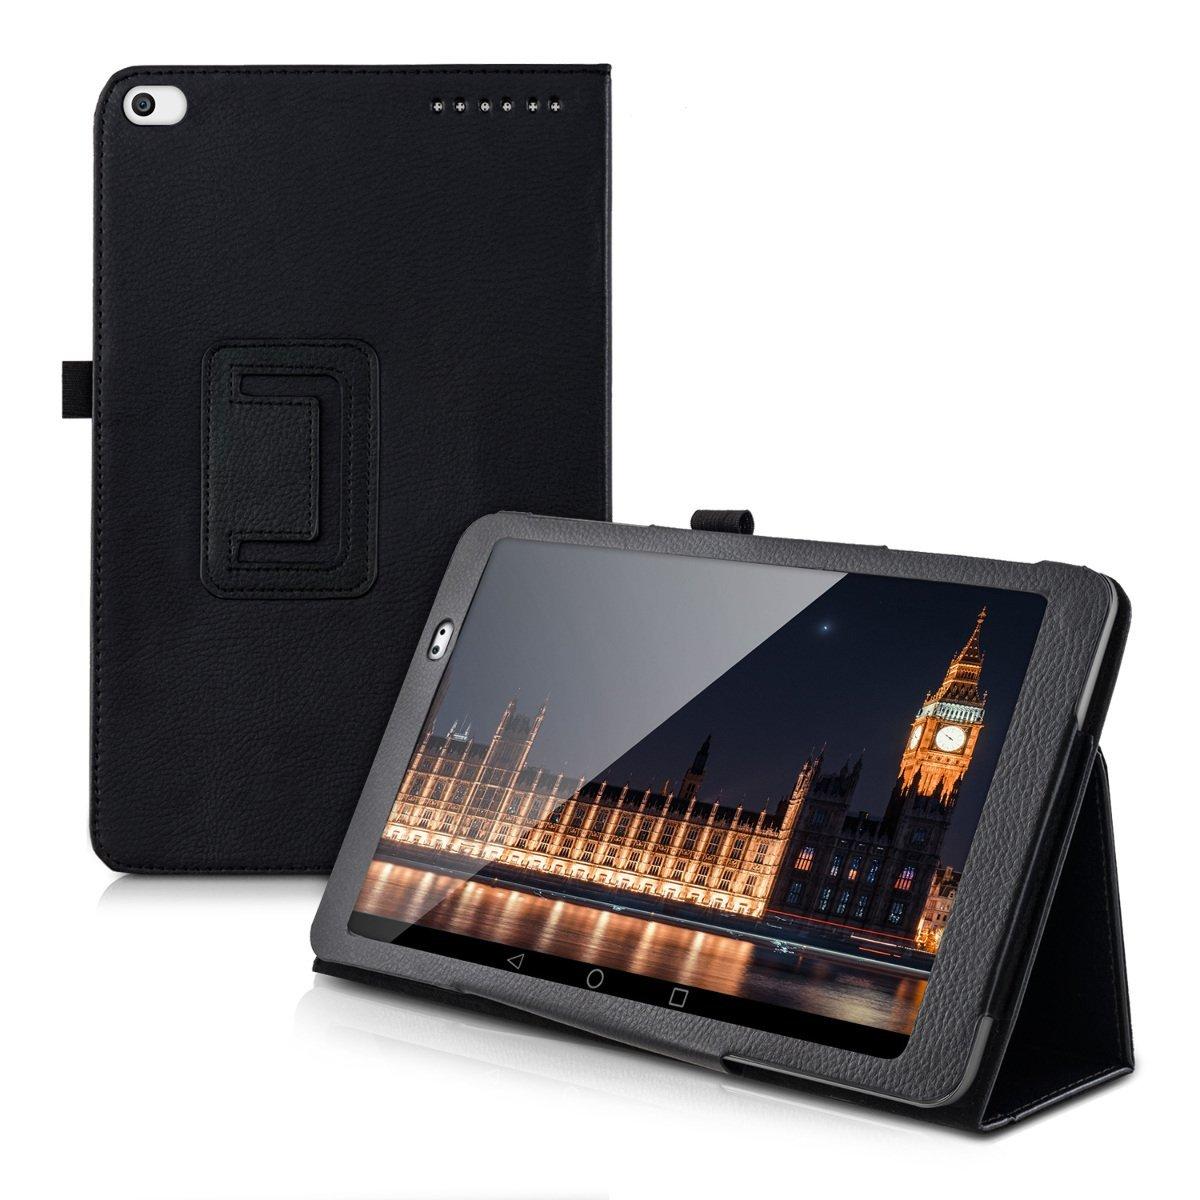 Husa Premium Book Cover tableta Huawei Mediapad T1, 9.6 inch, black